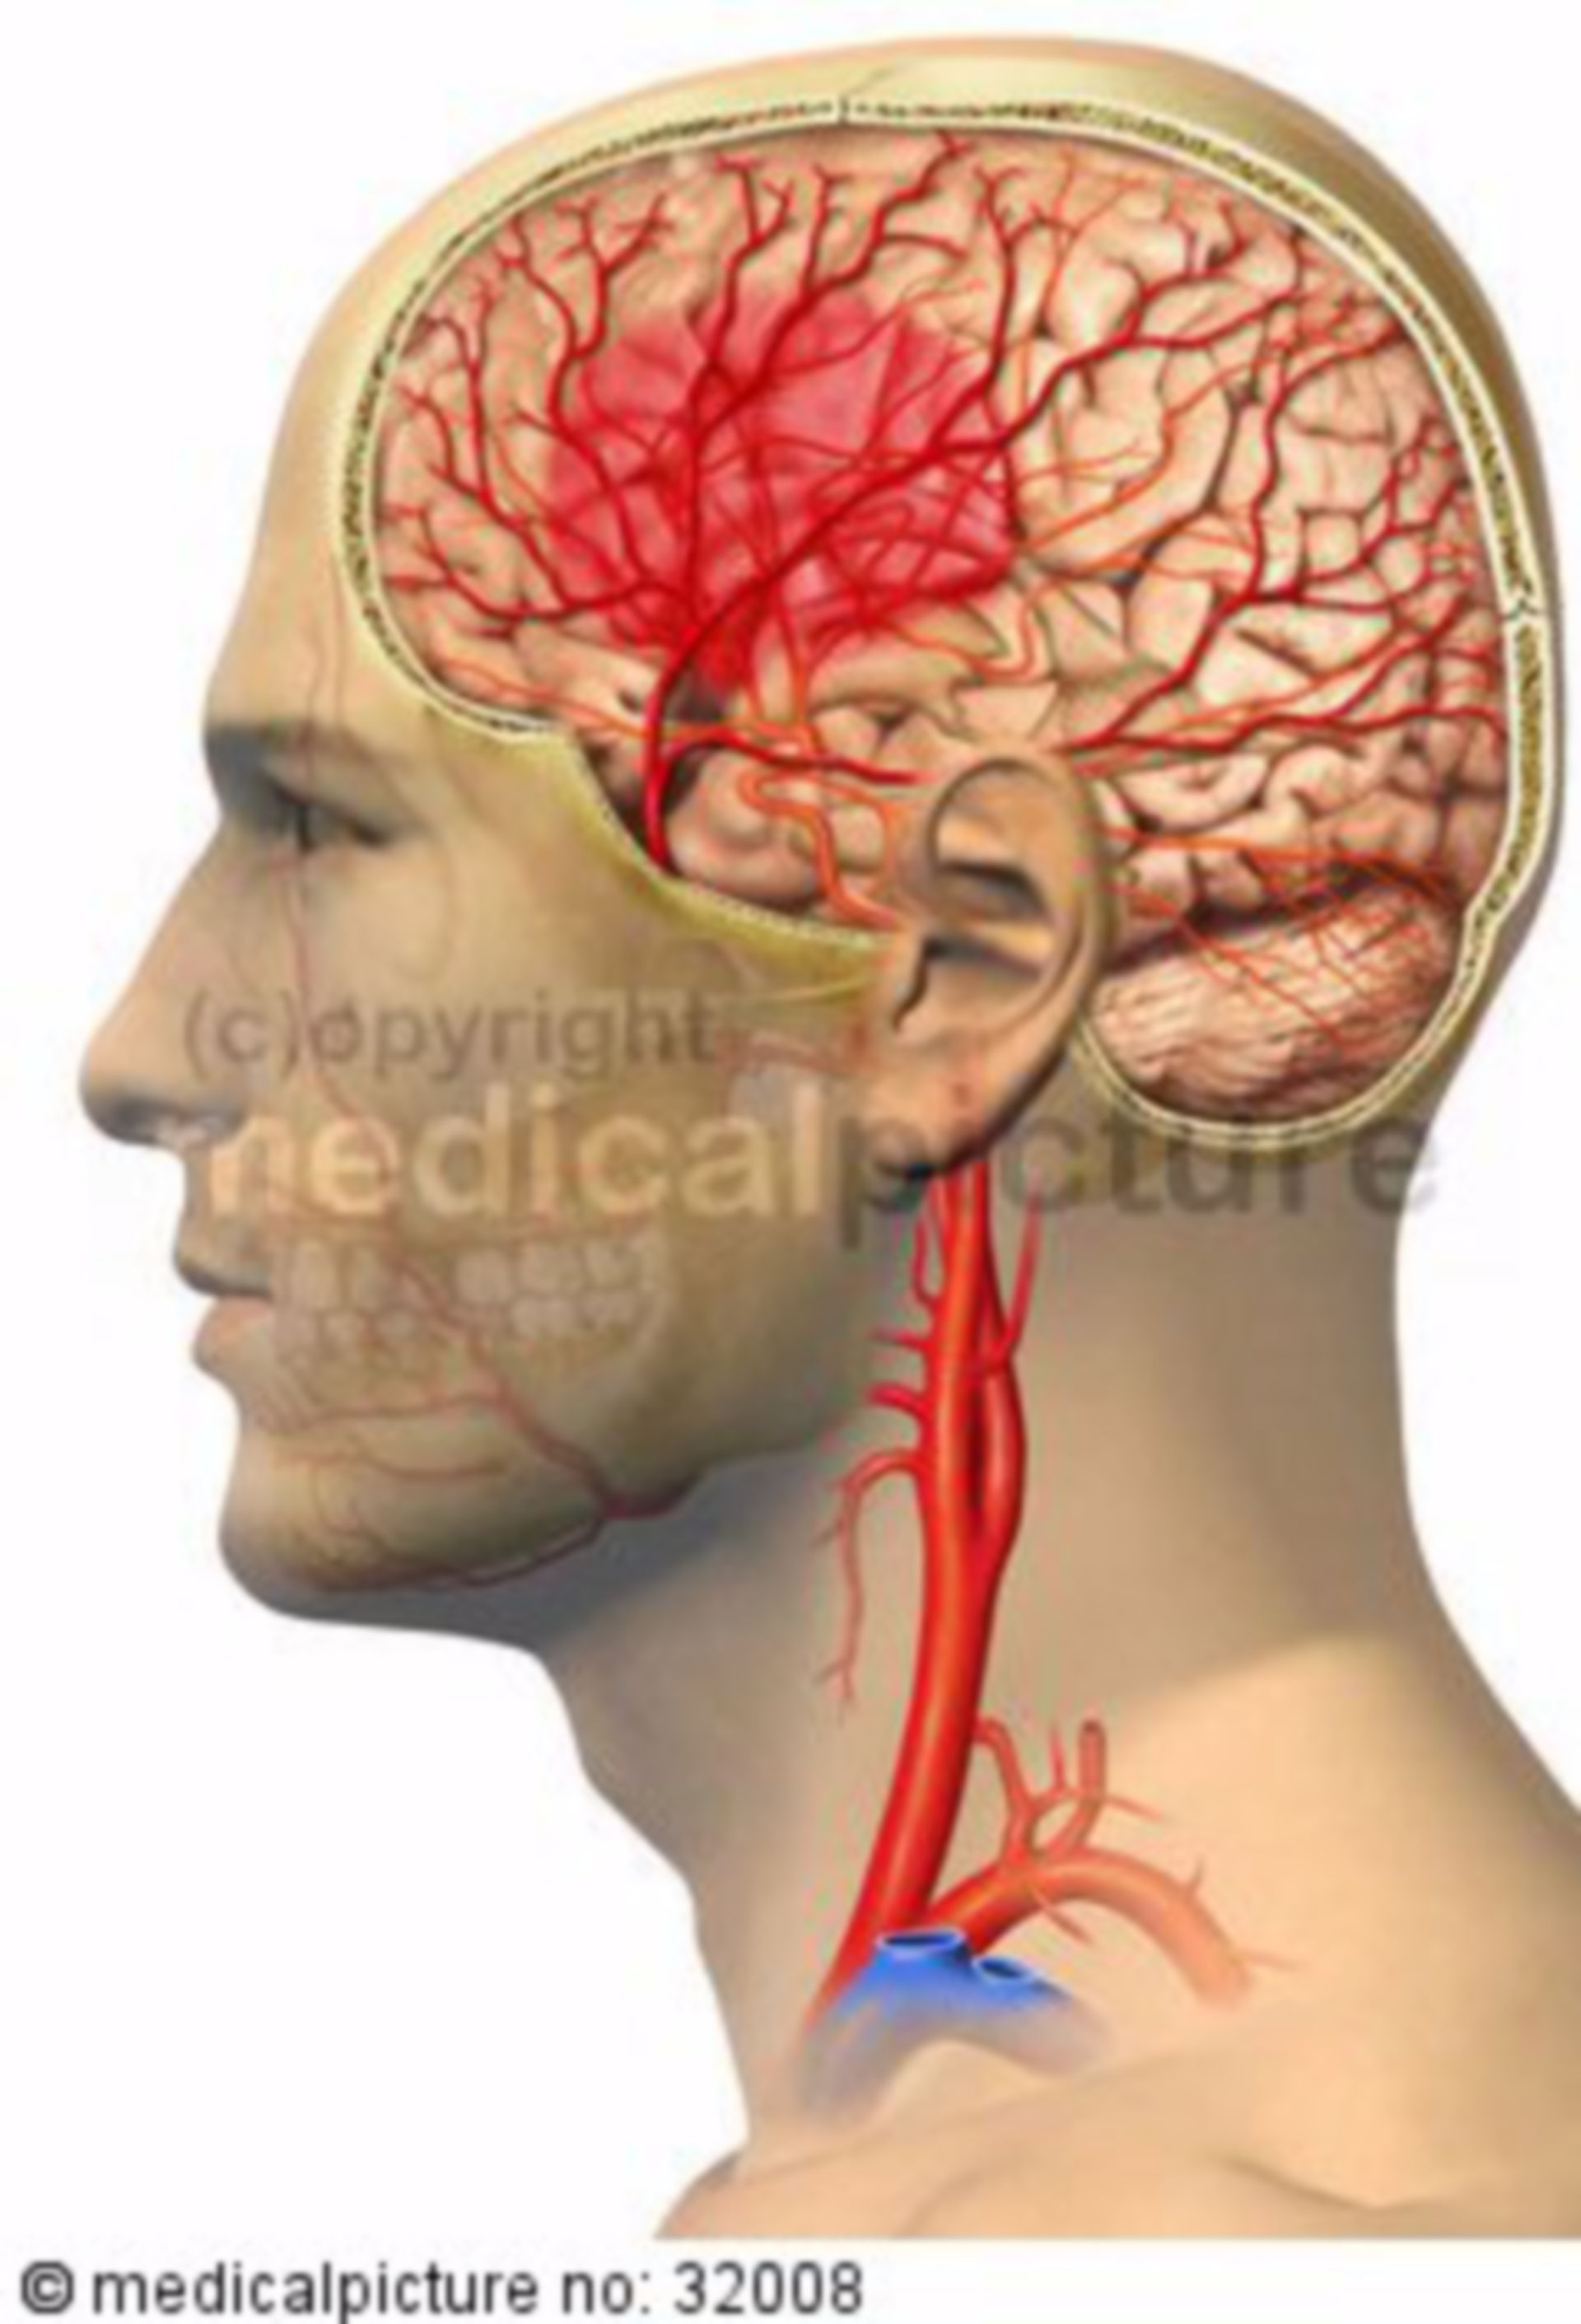 Apoplexy due to cerebral haemorrhage